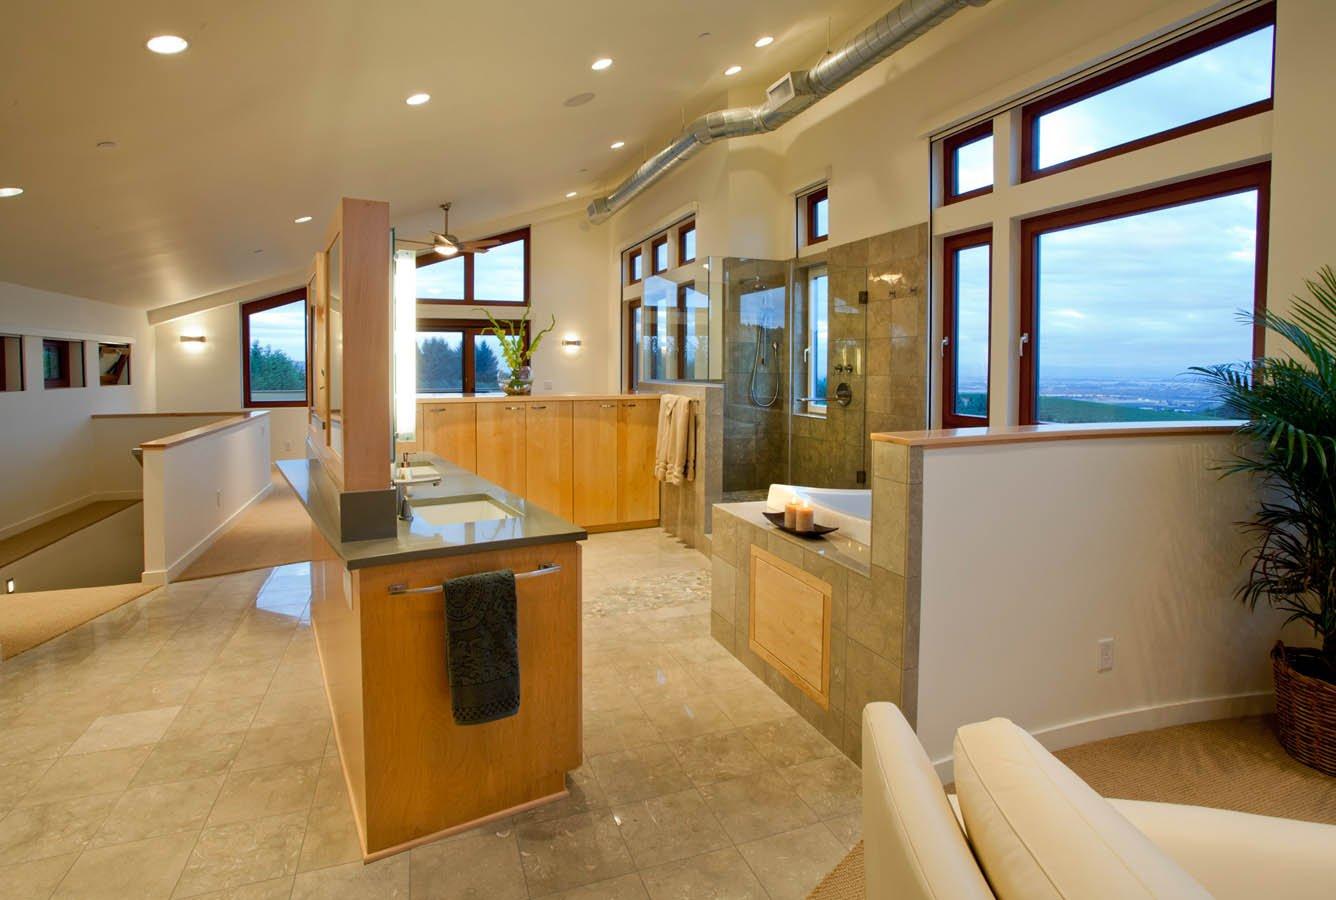 Northwest-Contemporary total bathroom makeover